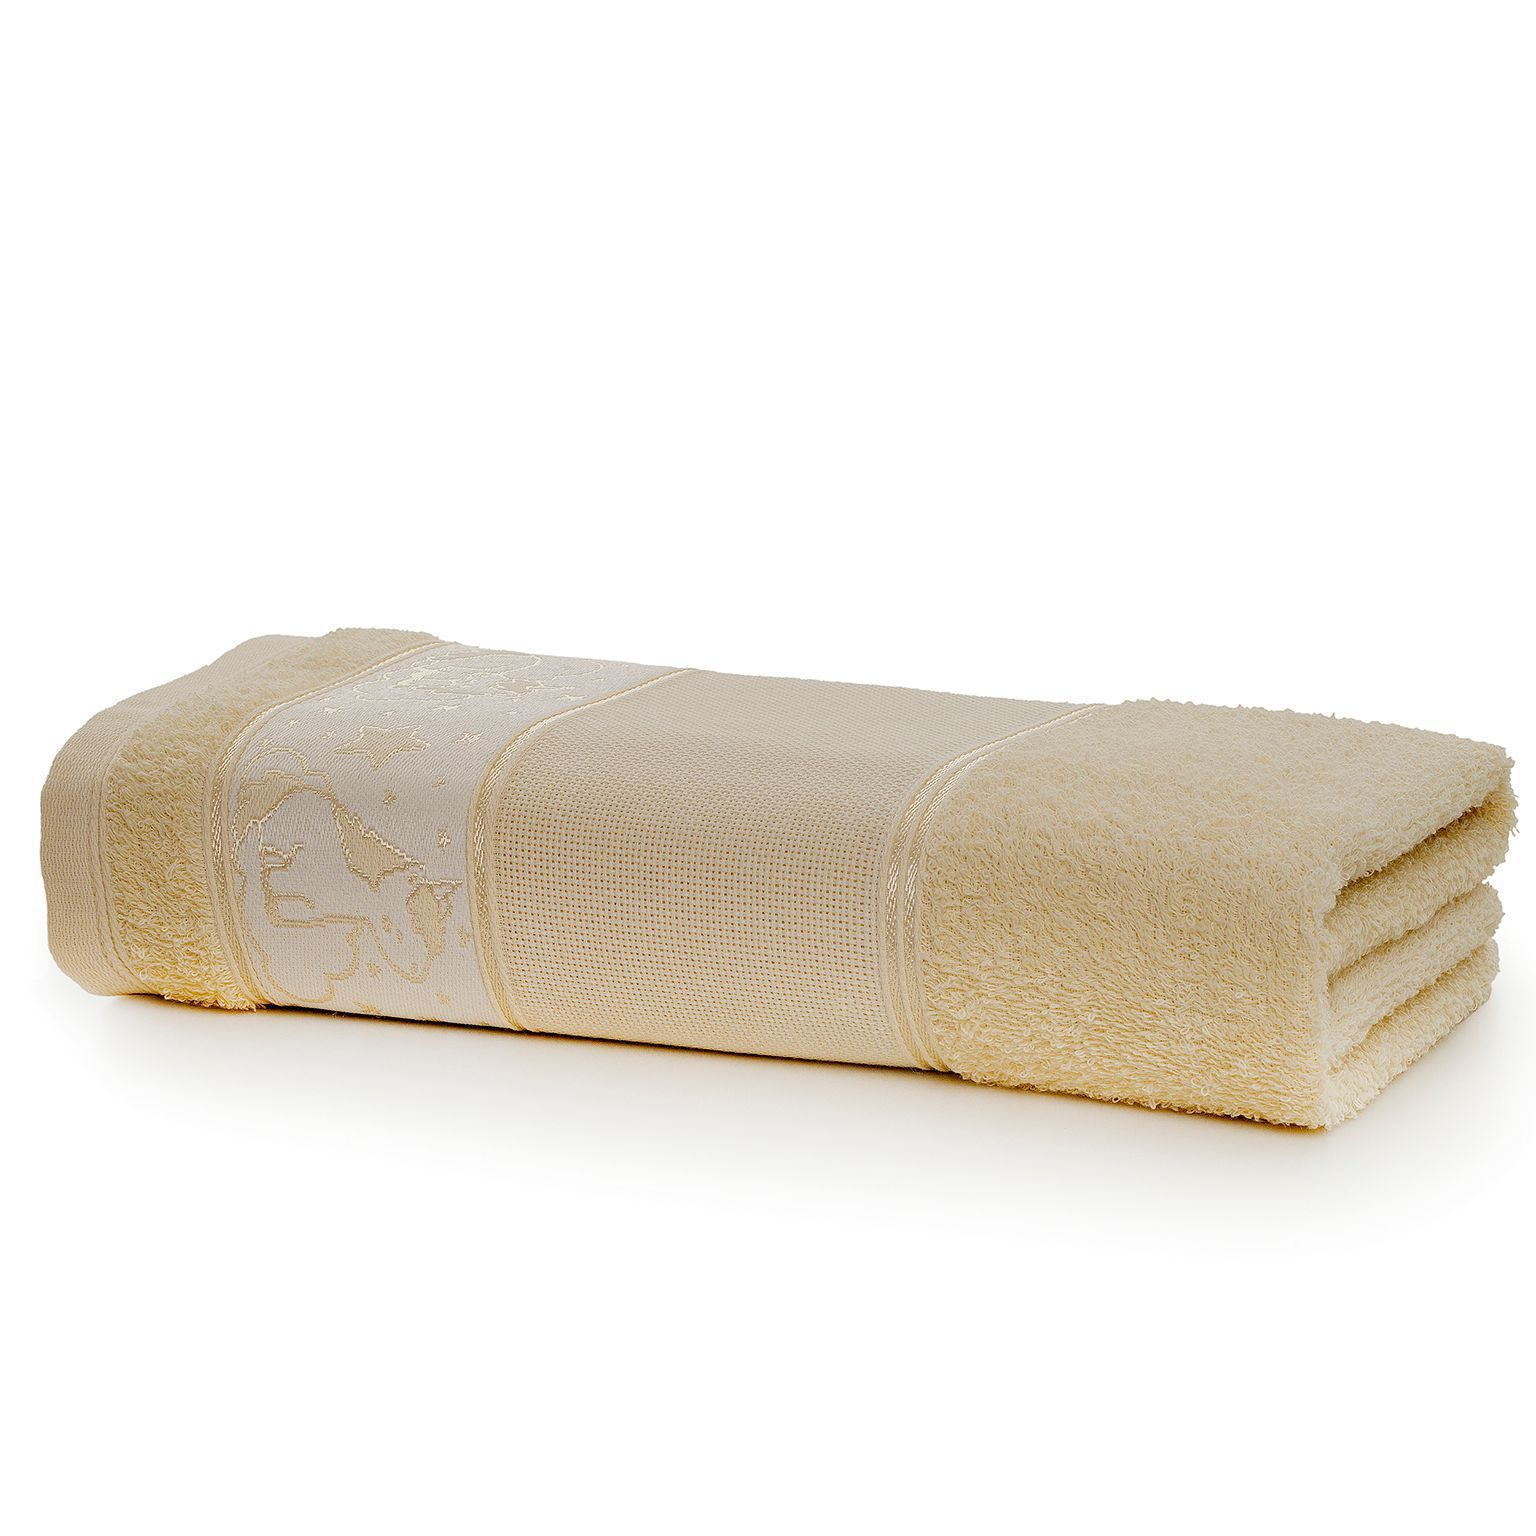 Toalha de Banho Infantil Pinta e Borda Magic Dream - Santista